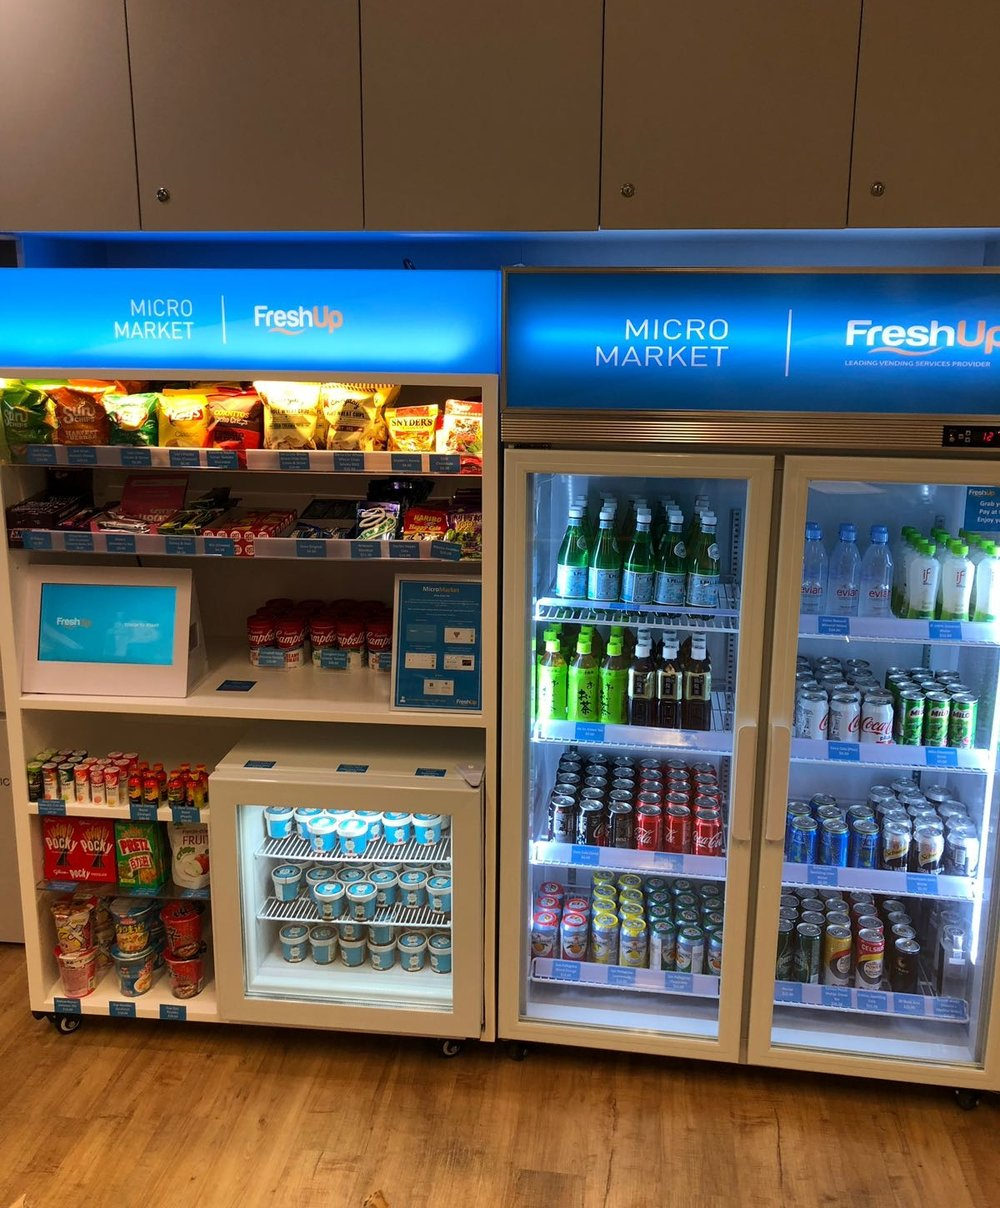 FreshUp,自動售賣機,自動販賣機,零食,飲品,方便,快捷,智能,投資銀行,辦公室,寫字樓,Micromarket,自助,法國興業銀行